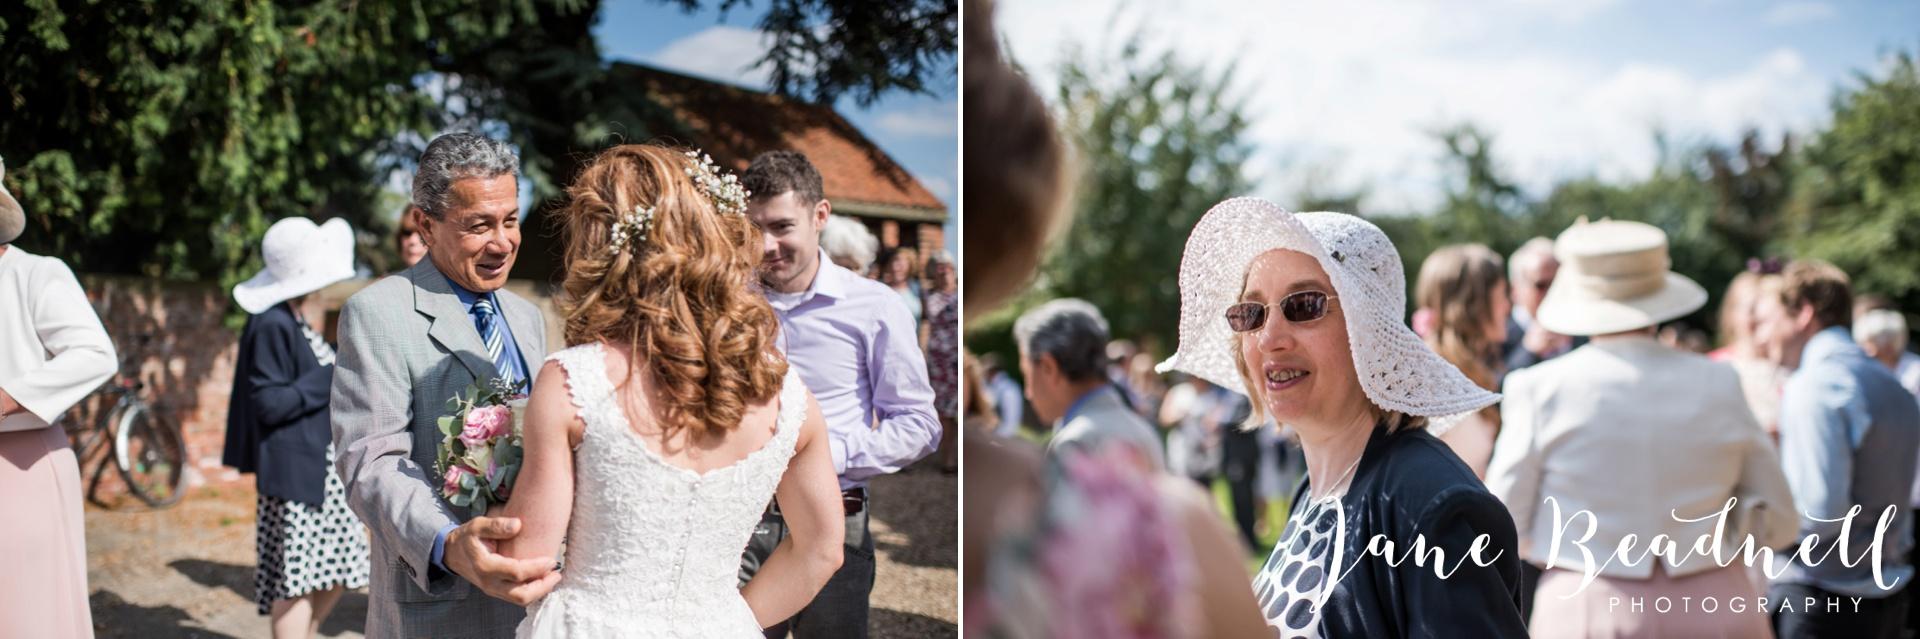 yorkshire-fine-art-wedding-photographer-jane-beadnell-photography-poppleton-york_0073